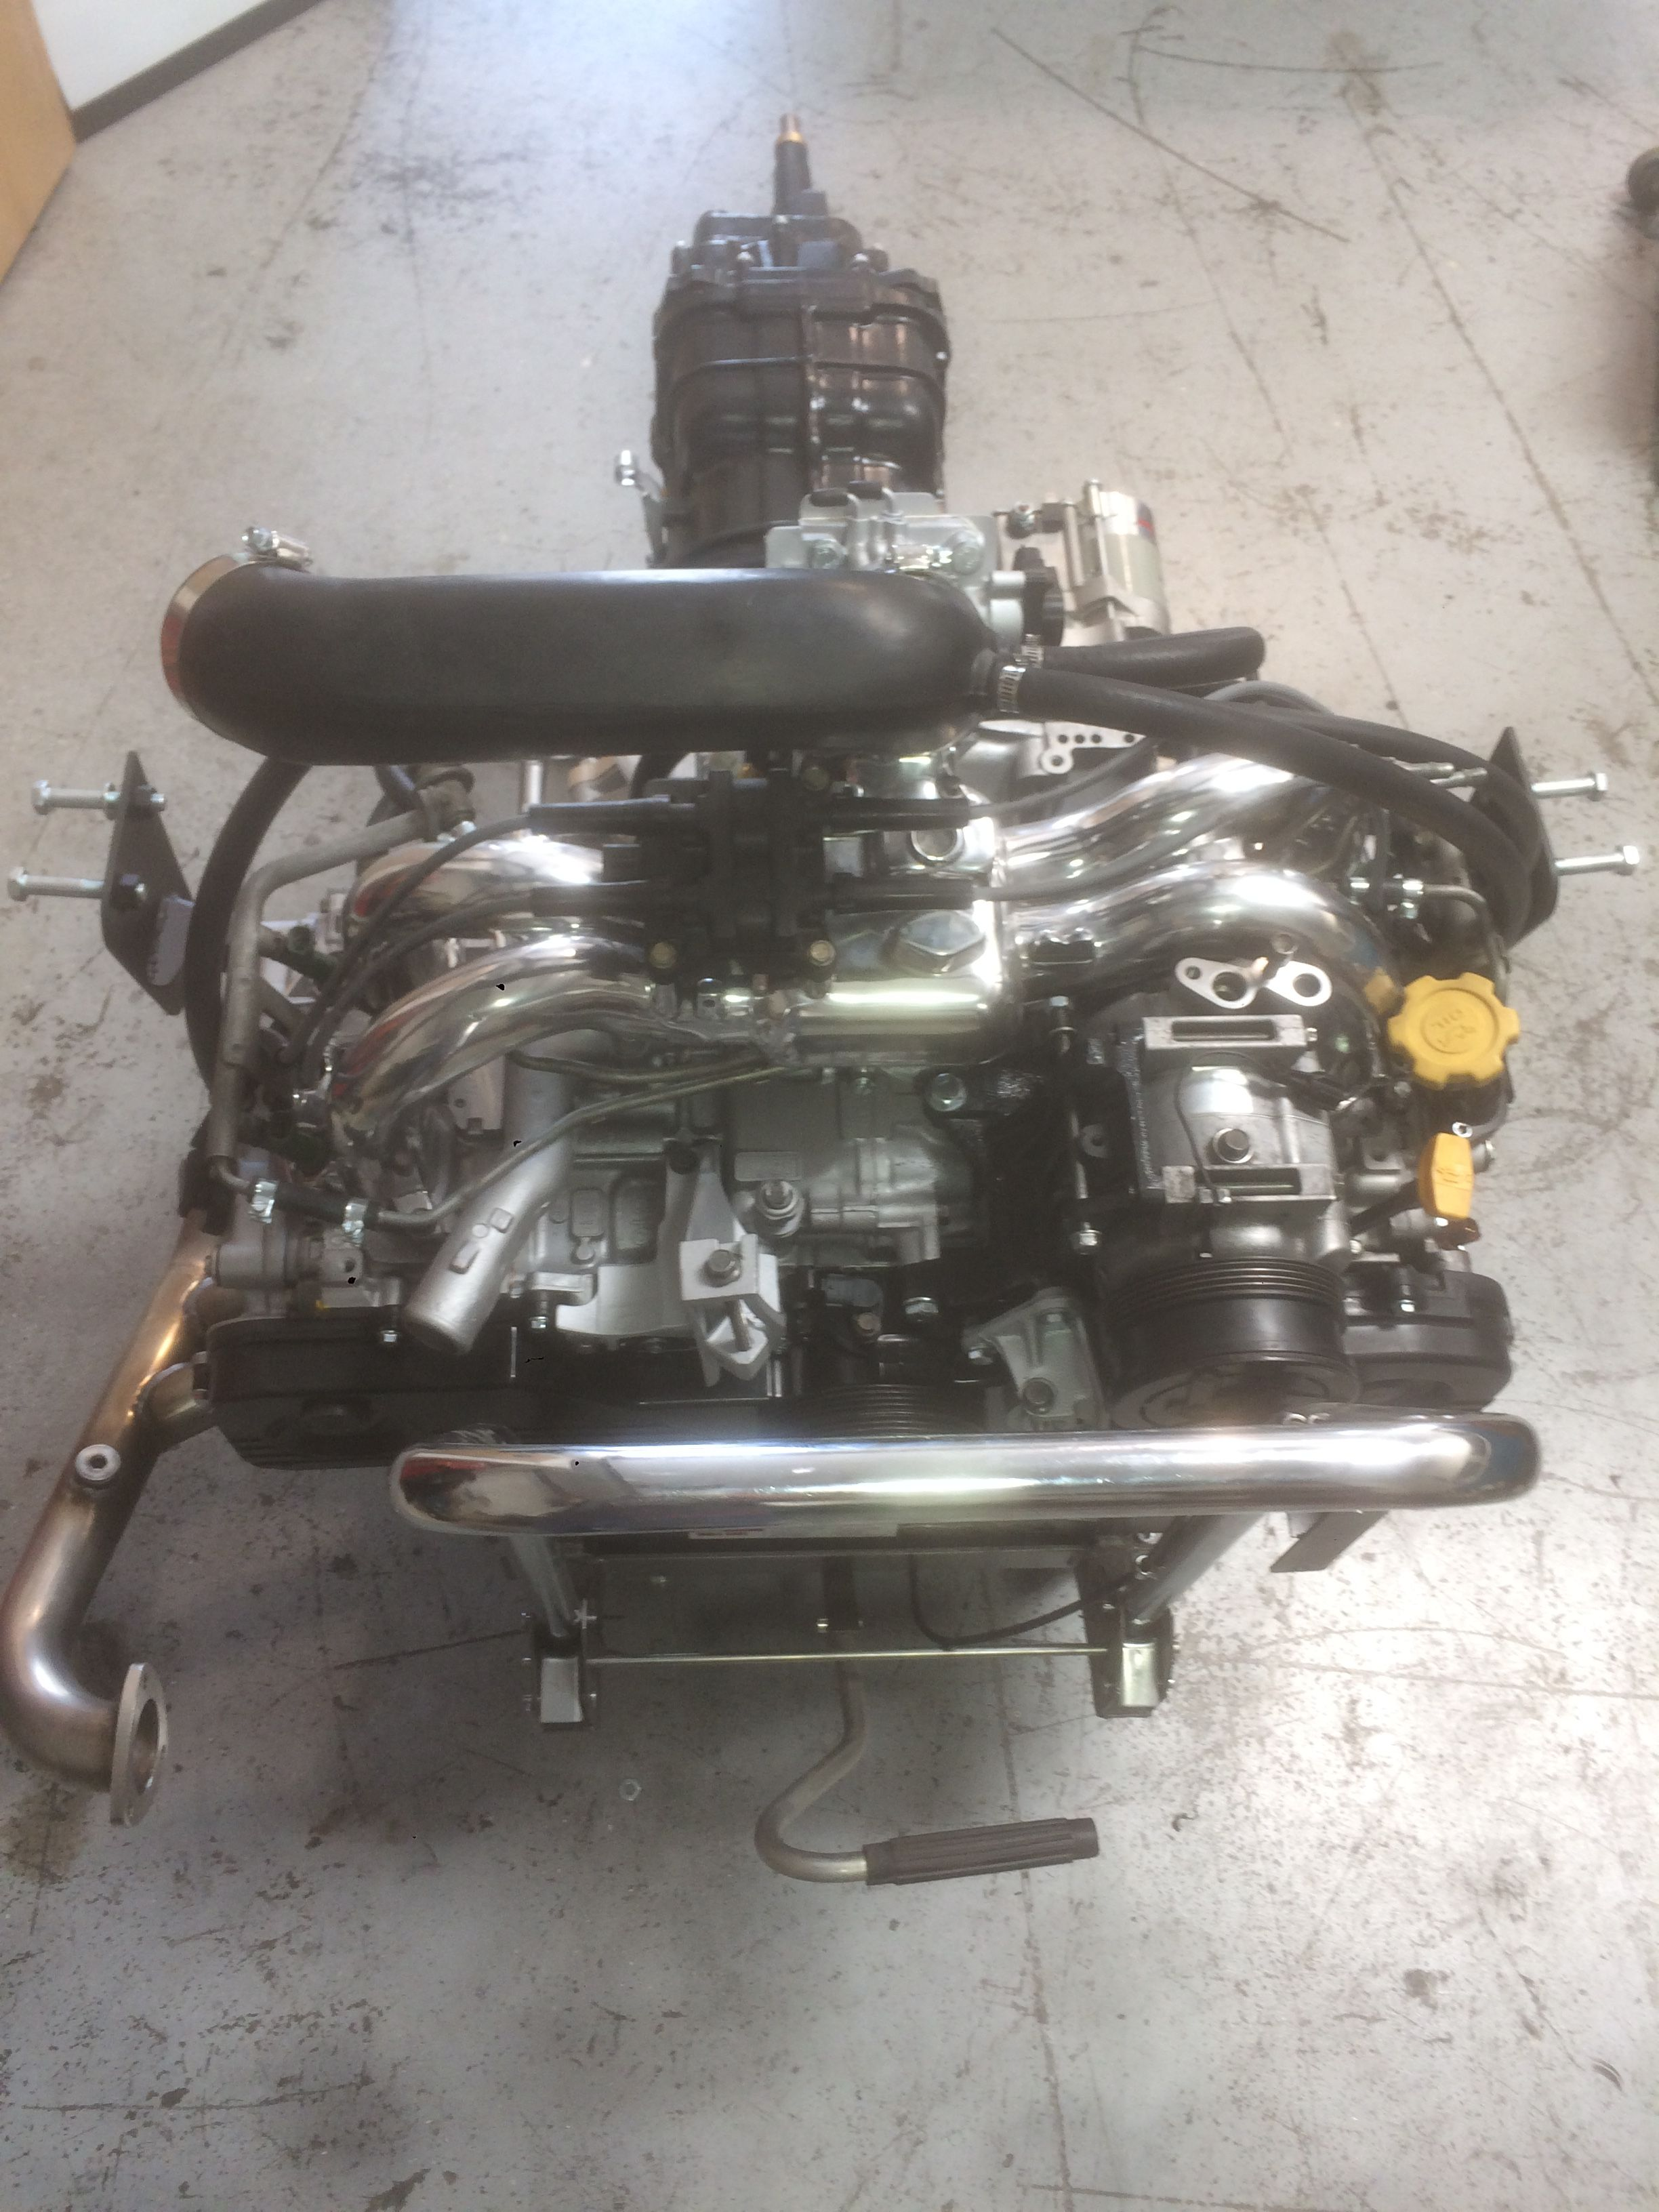 Subiswaps Subaru Engine Conversion Subiswapssubaruconversion Wiring Harness Subiswapssubaruconversionvolkswagenvwvwbusvwbugvanagon